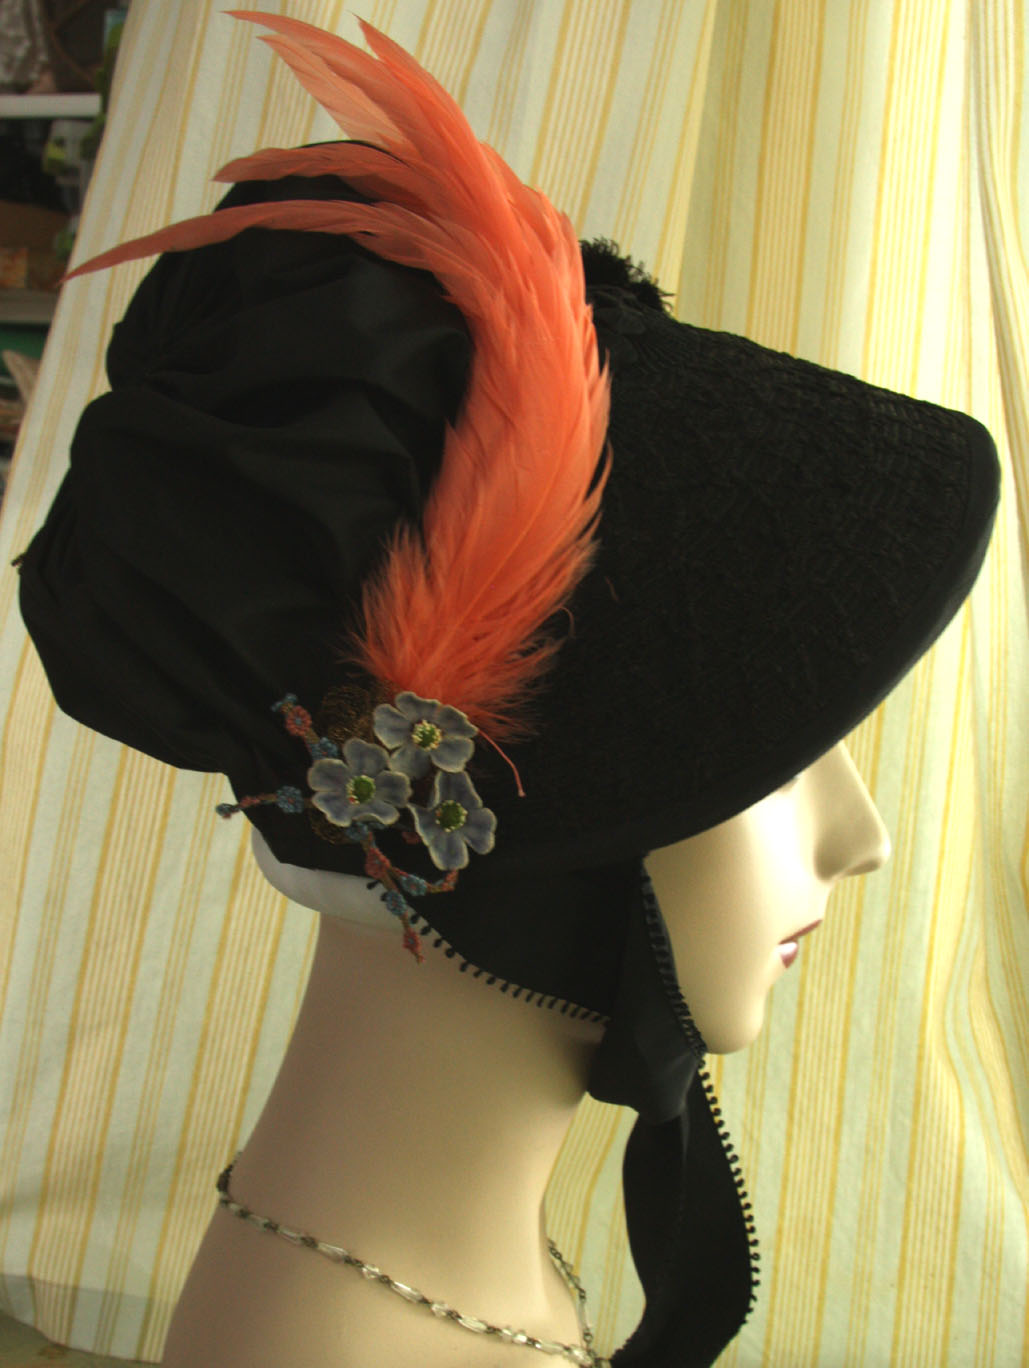 Duchess Trading: New bonnet-black regency cap